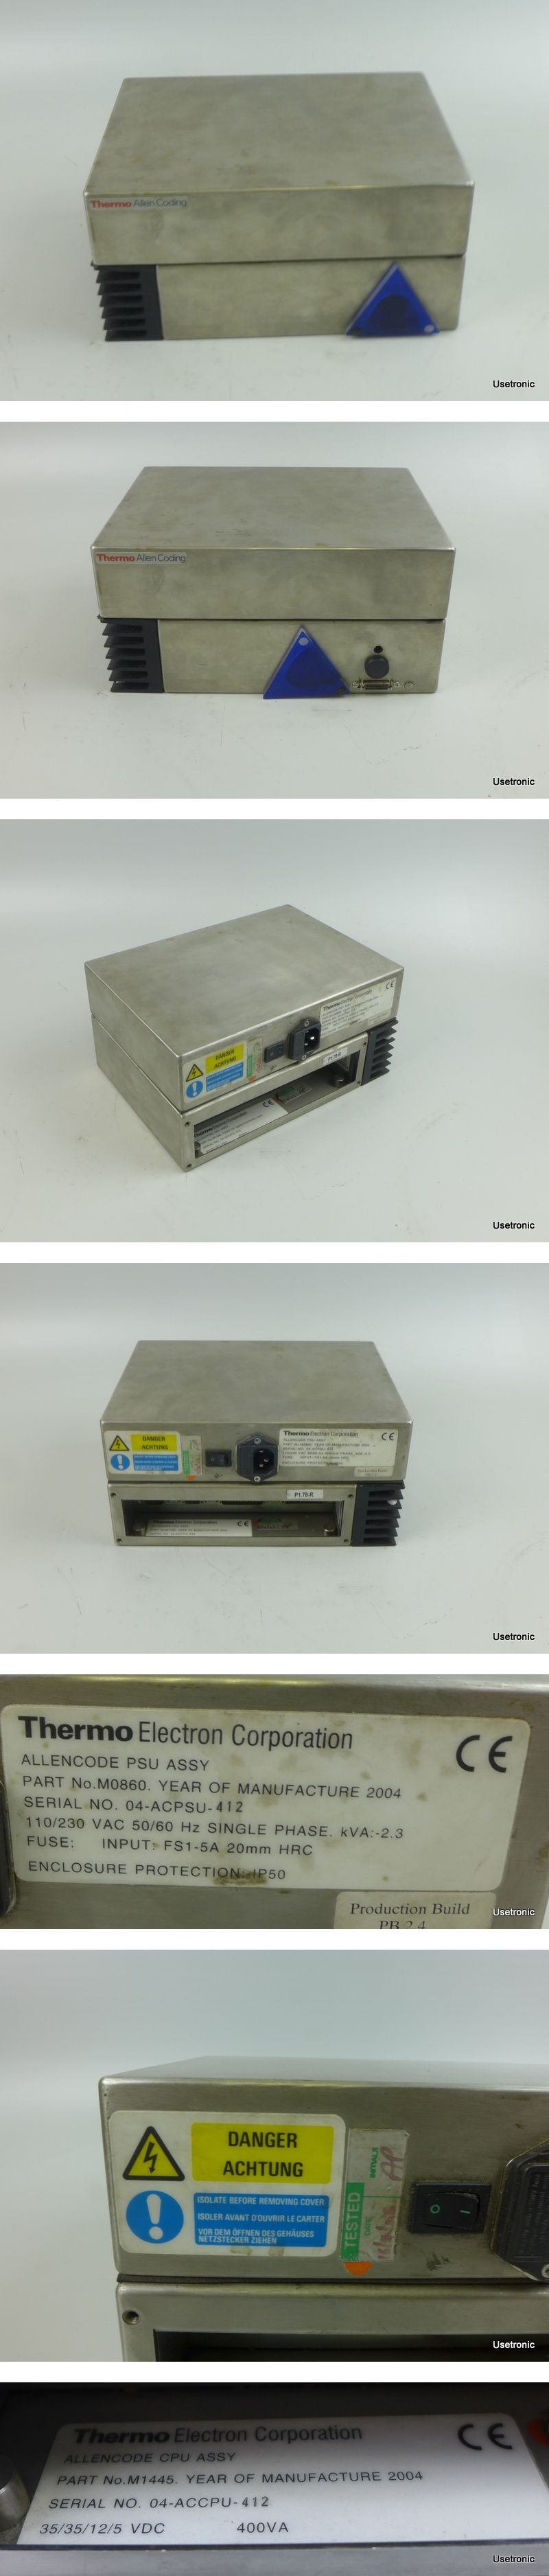 Allen Coding Allencode PSU M0860 CPU M1445